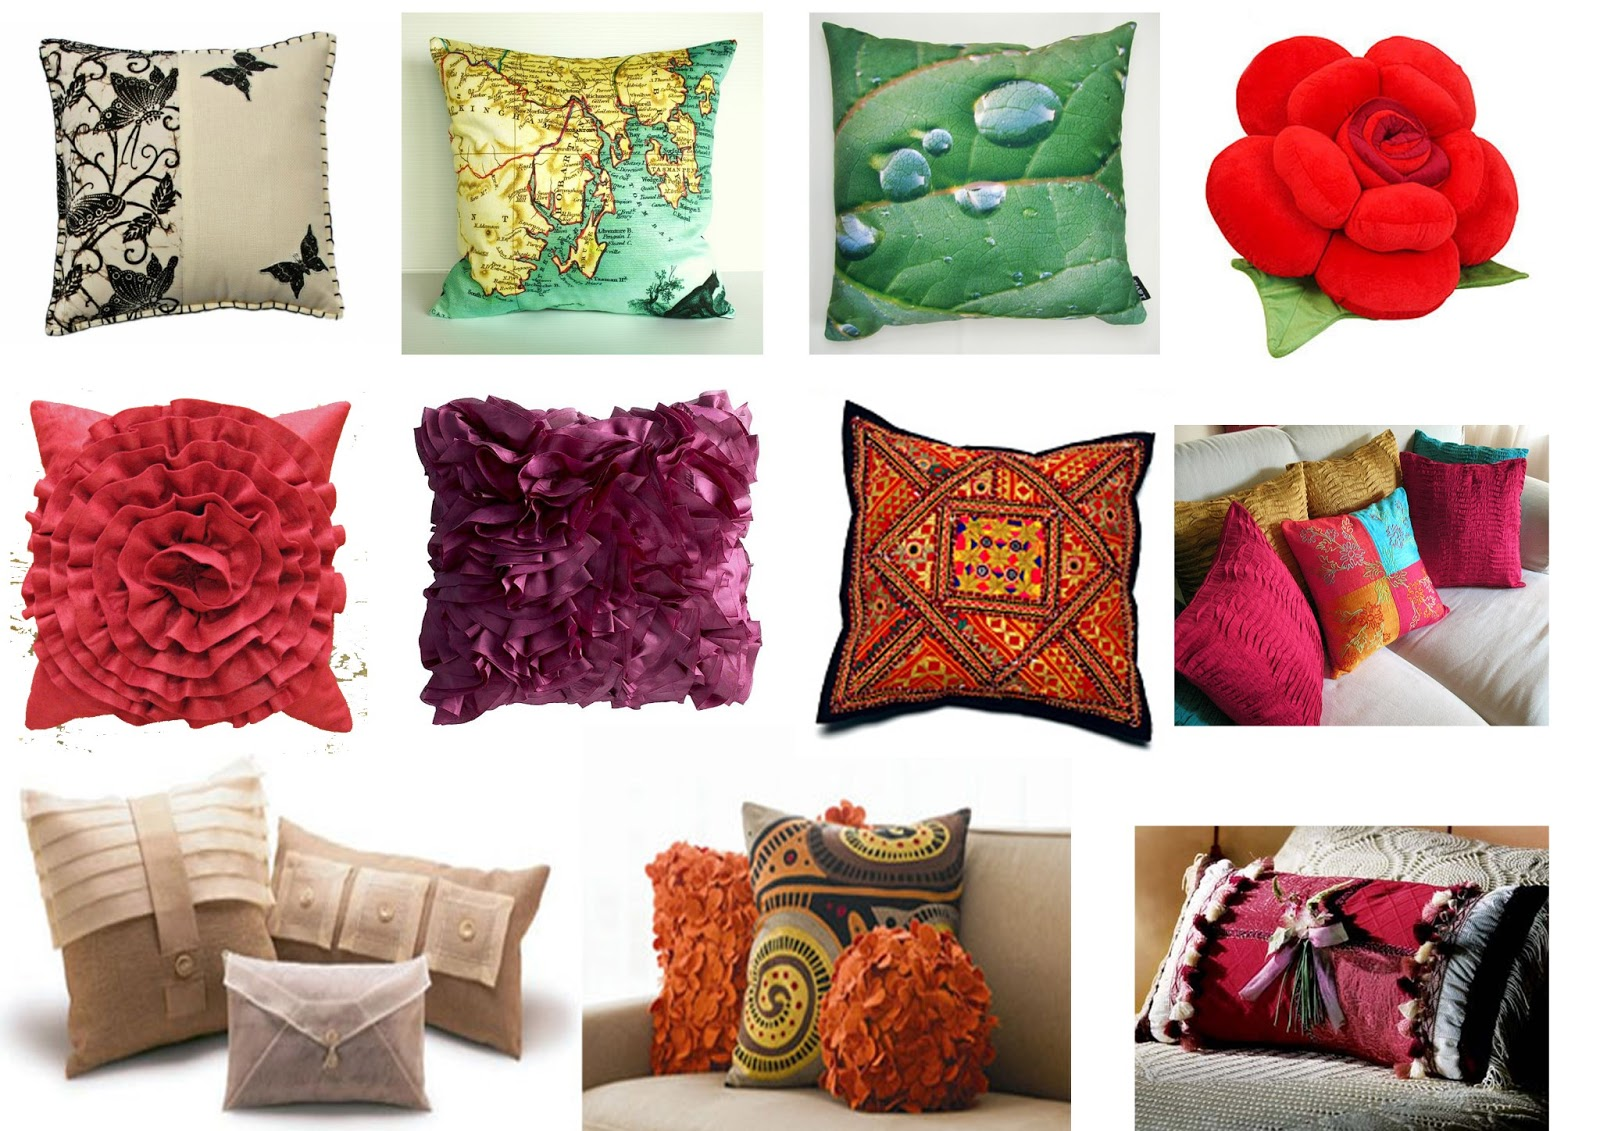 Koleksi pelbagai jenis sarung bantal.